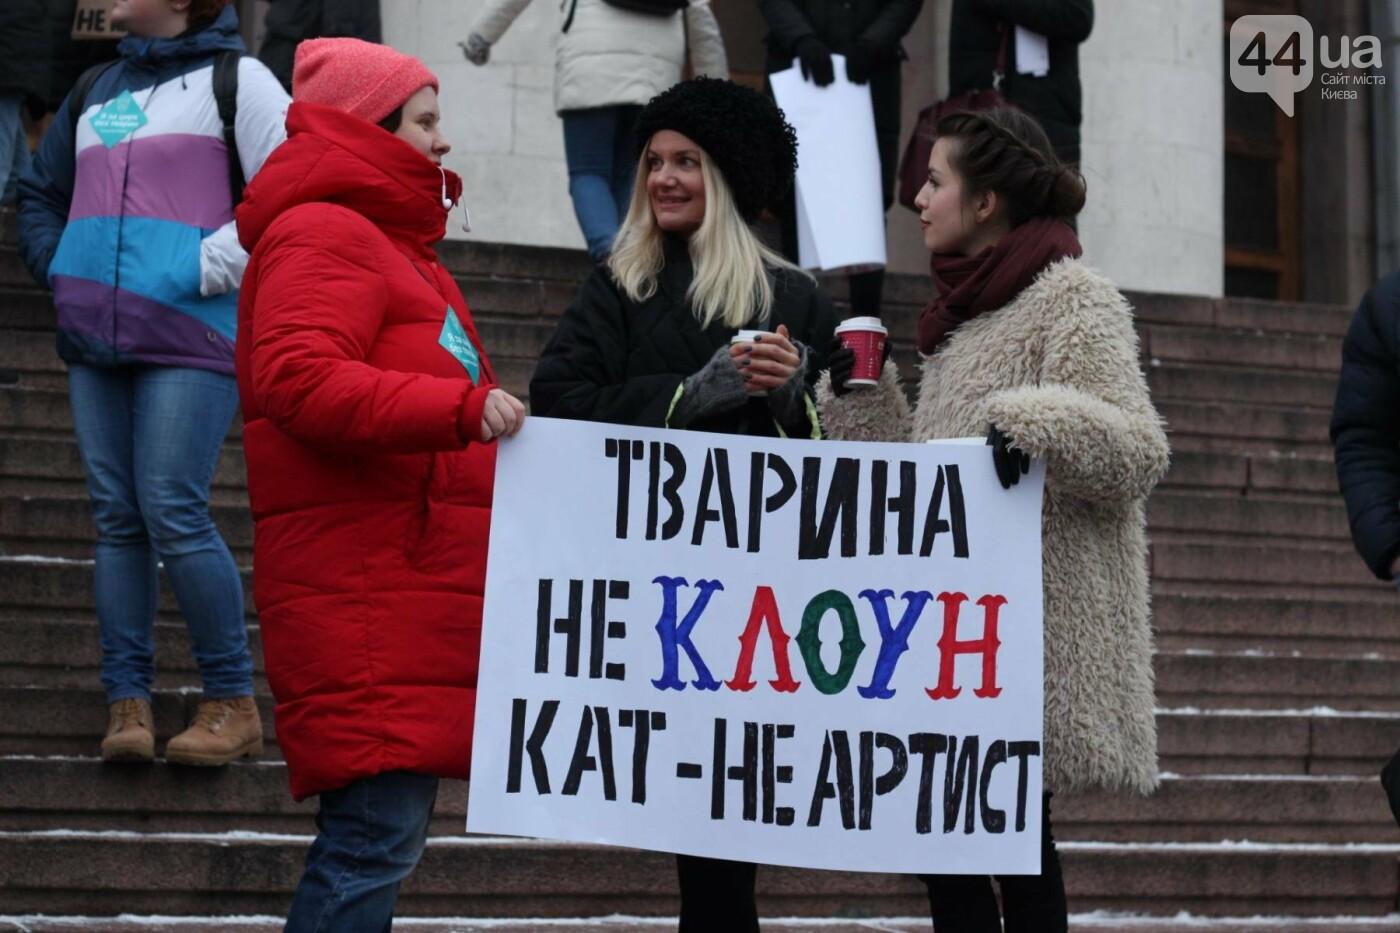 Цирк без животных: как в Киеве прошла акция протеста, фото-30